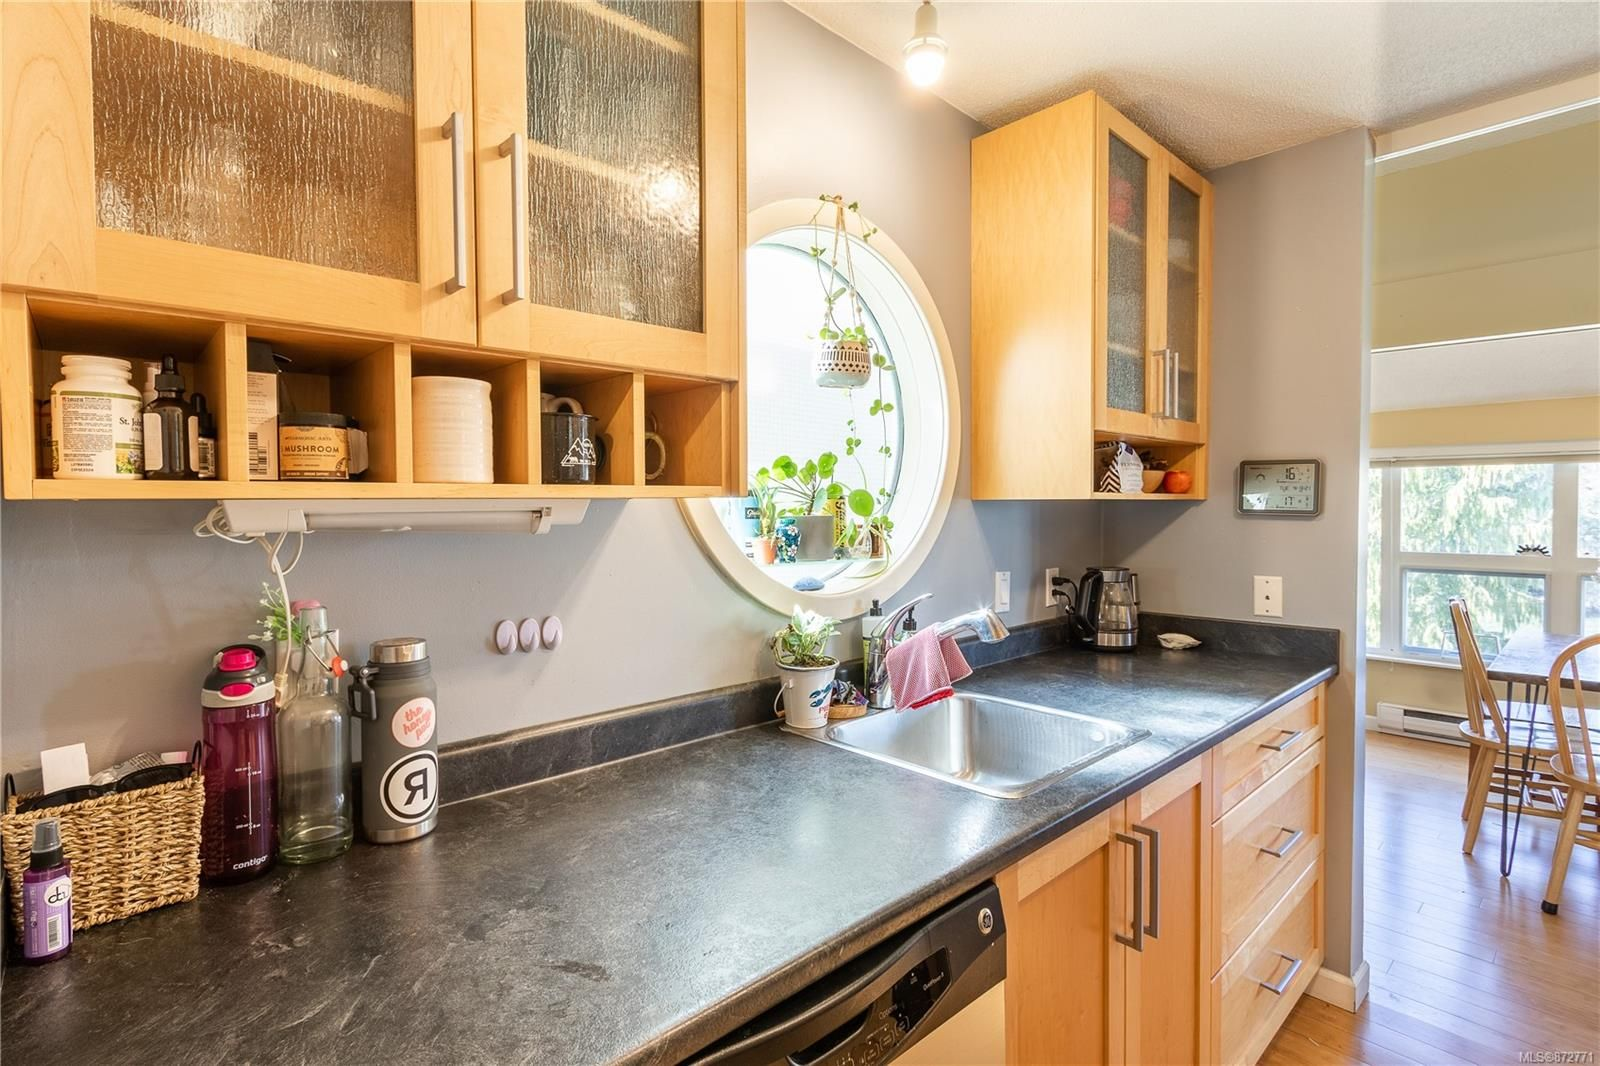 Photo 10: Photos: 305 205 1st St in : CV Courtenay City Condo for sale (Comox Valley)  : MLS®# 872771